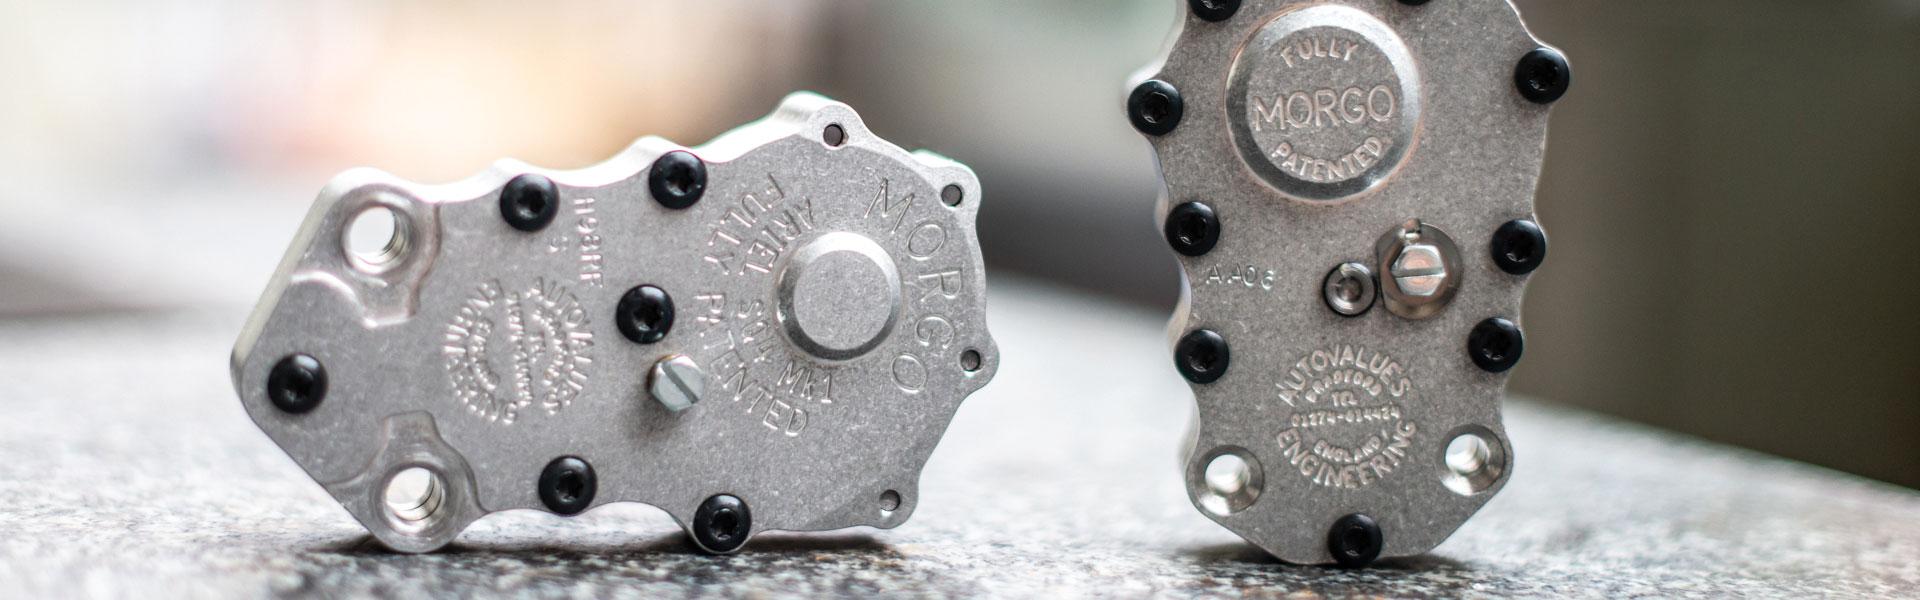 Morgo Bike Parts Restoration Upgrade Classic